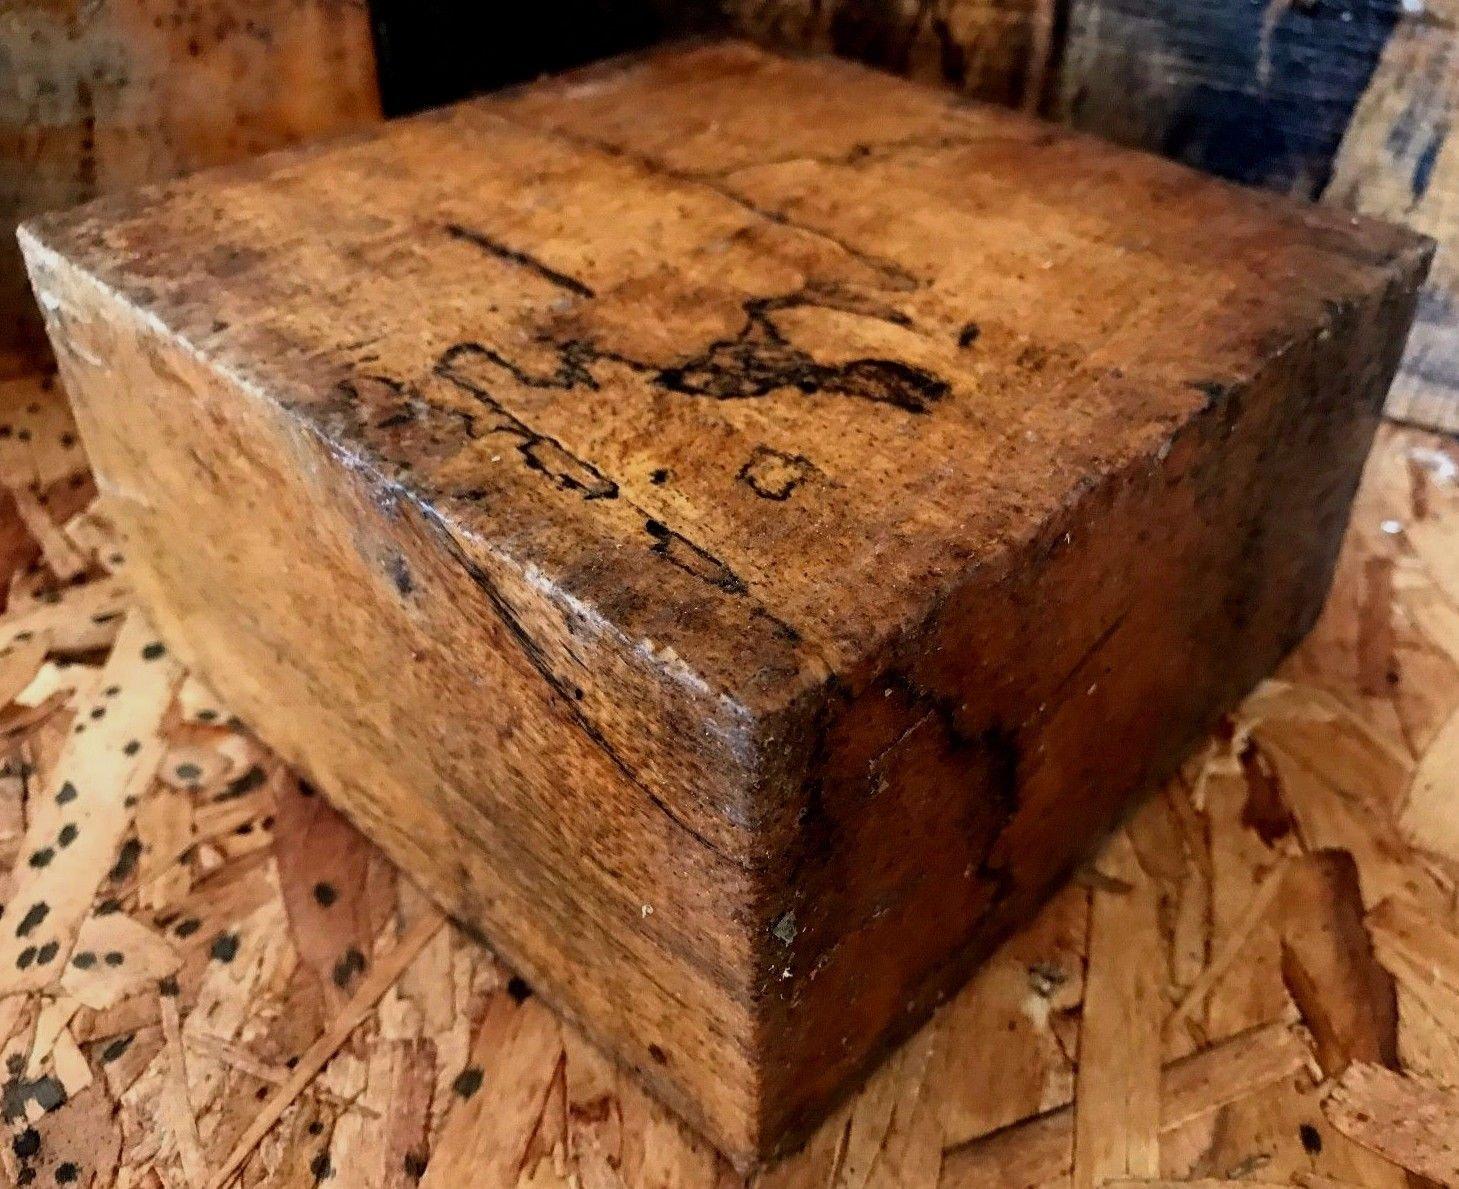 Spalted Tamarind Lumber Lathe Woodturning 6x6x3 Woodworking Knife Handles Wood